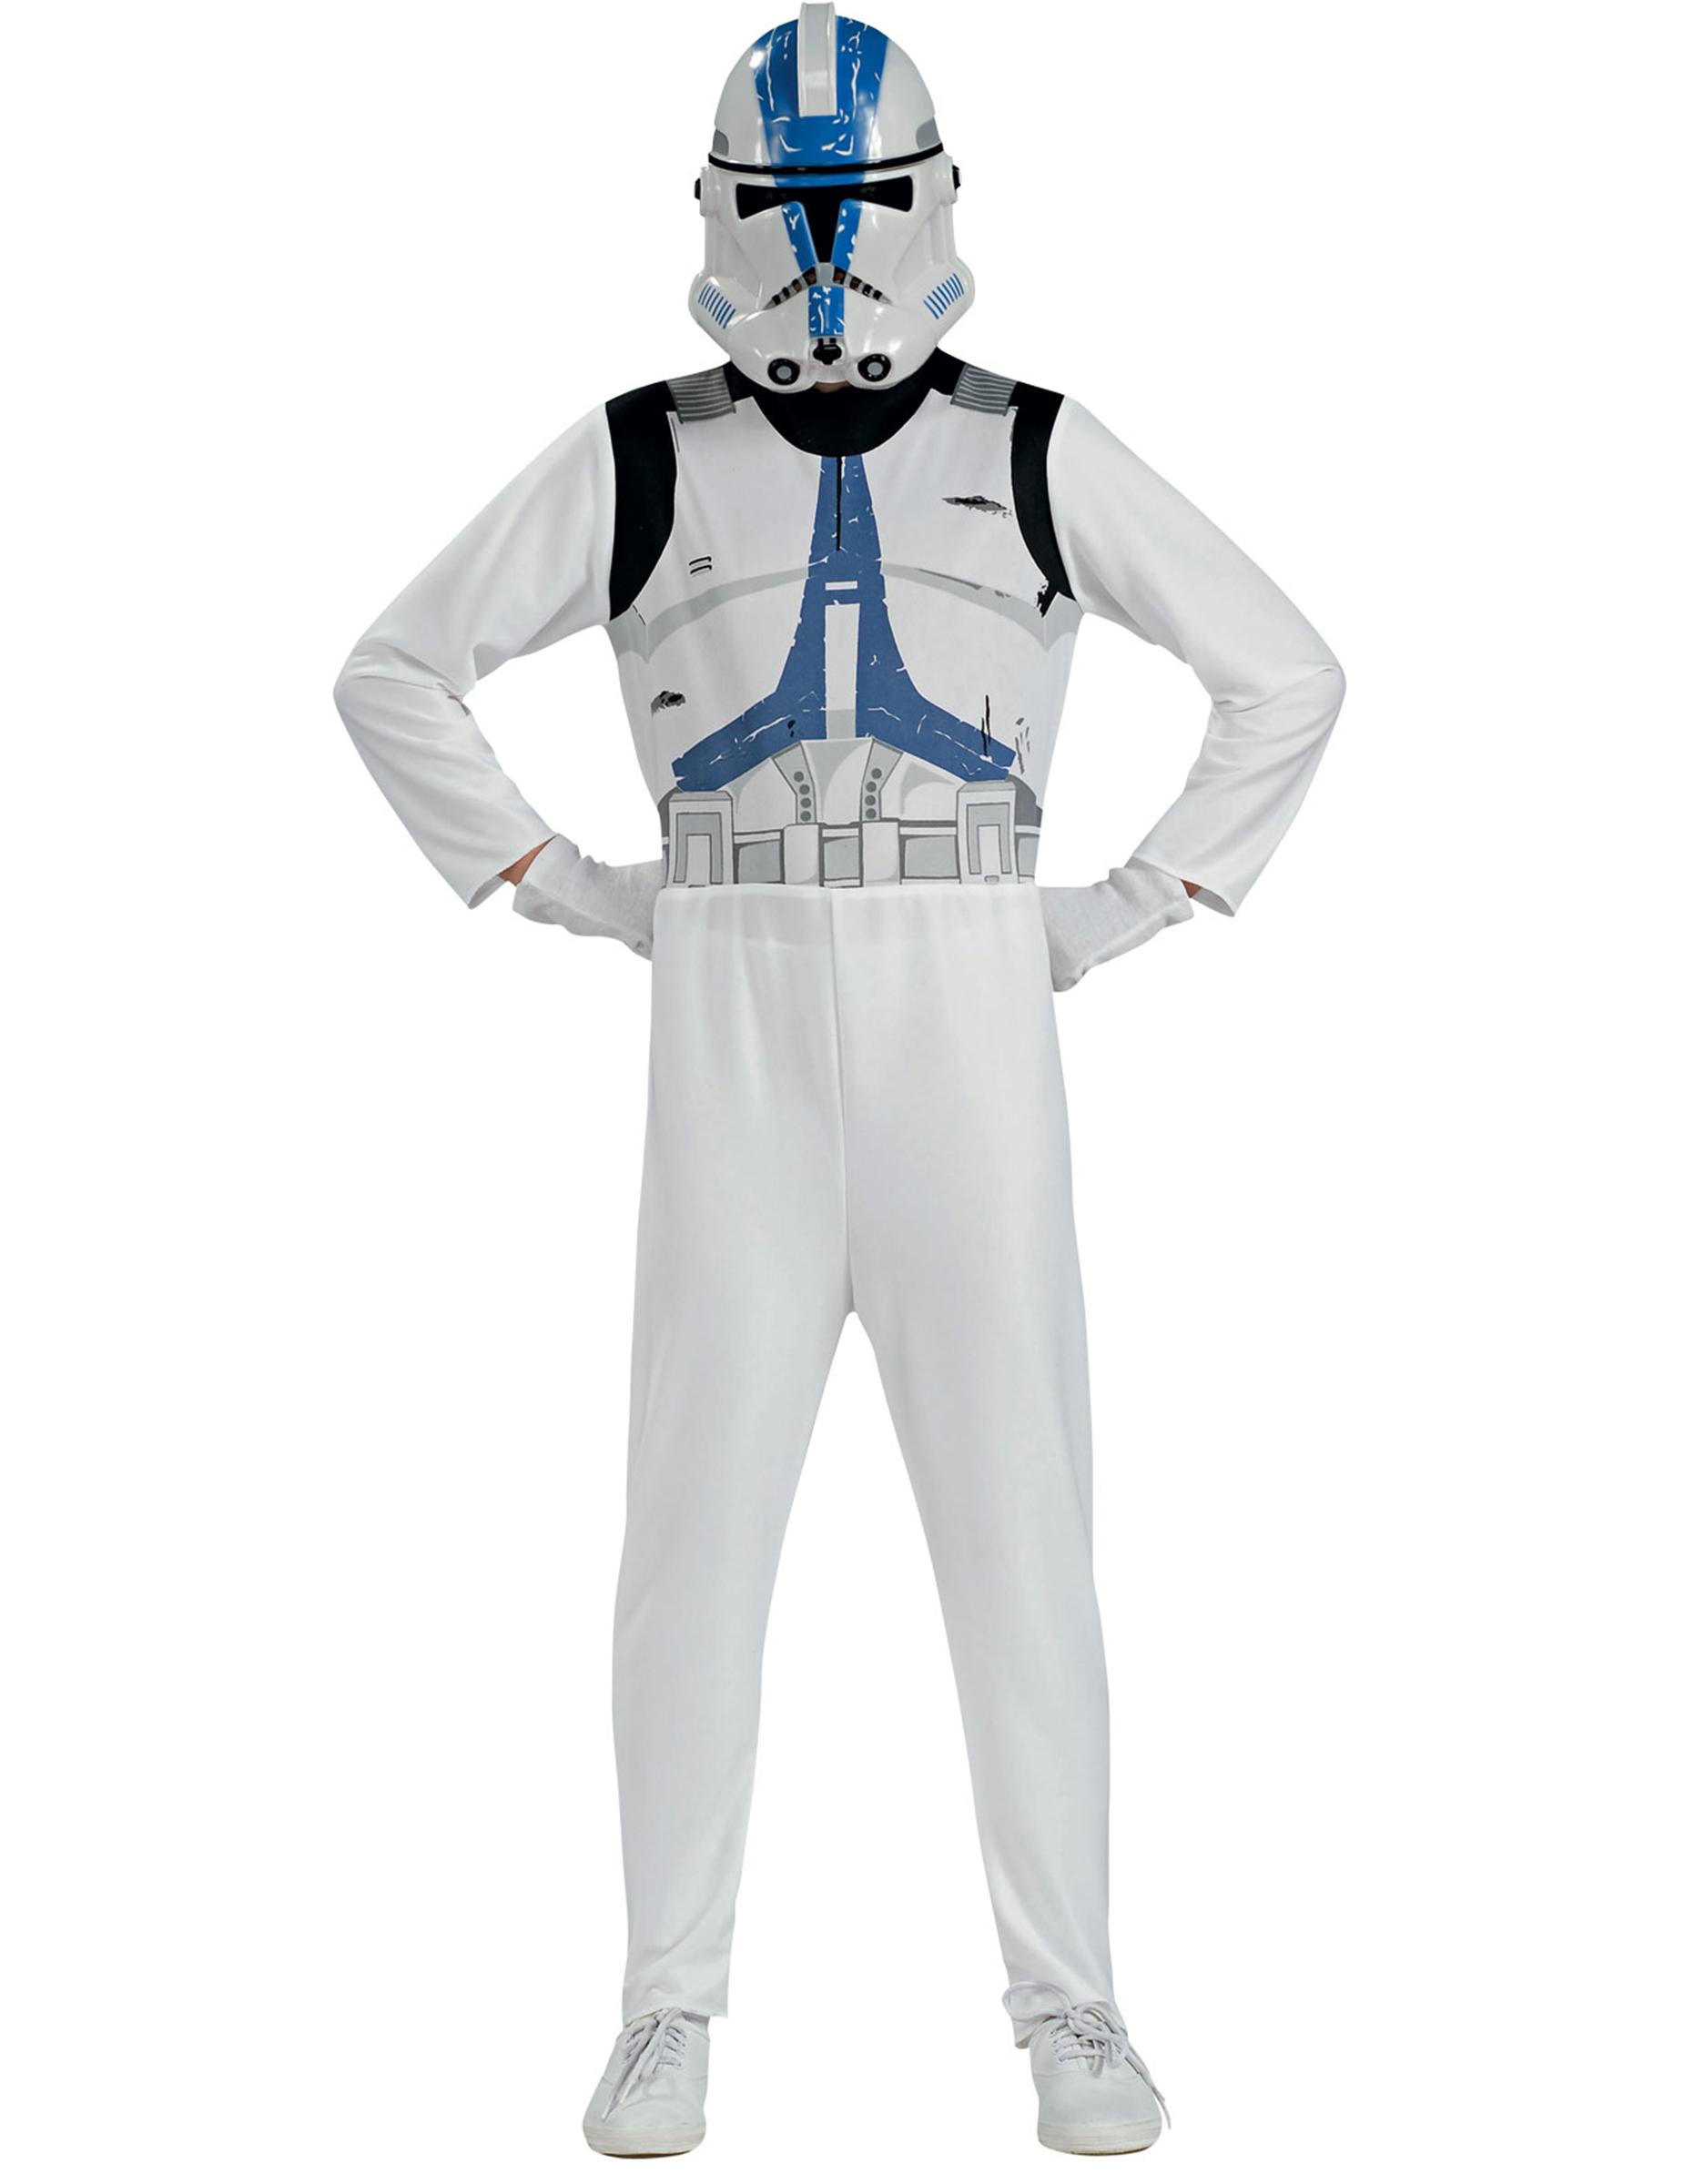 d guisement clone trooper star wars gar on deguise toi. Black Bedroom Furniture Sets. Home Design Ideas